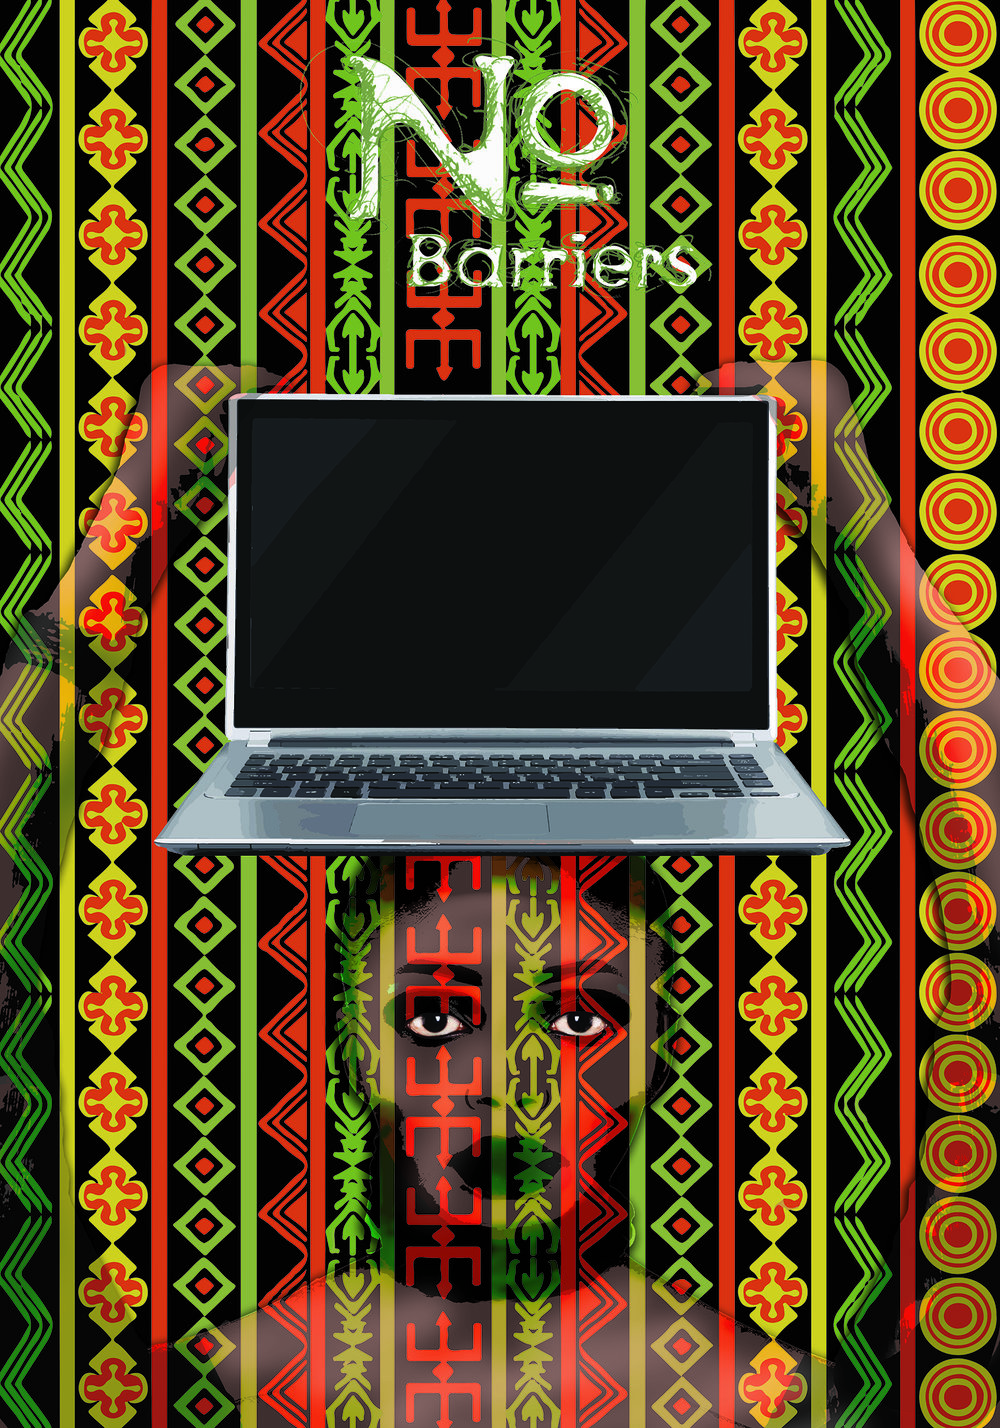 Eric Boelts NoBarriersAfrican Poster.jpg